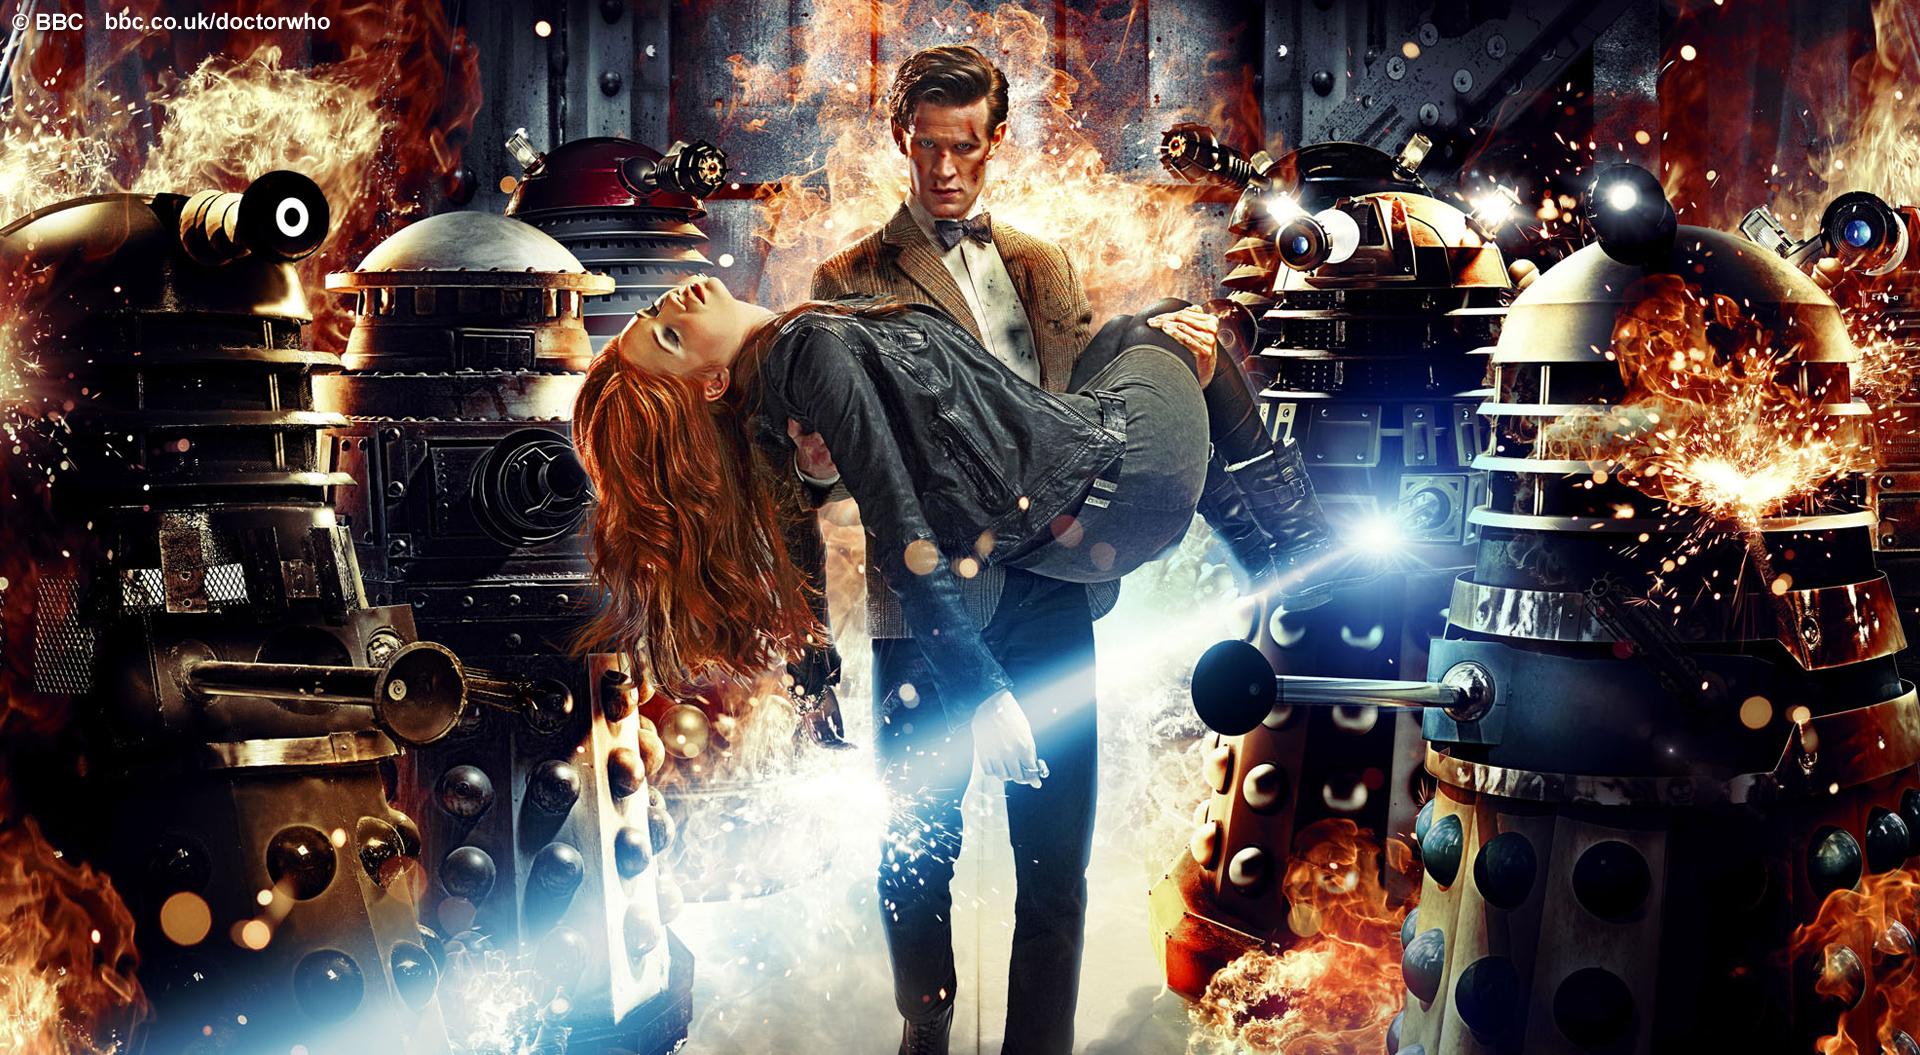 48 Doctor Who Series 9 Wallpaper On Wallpapersafari